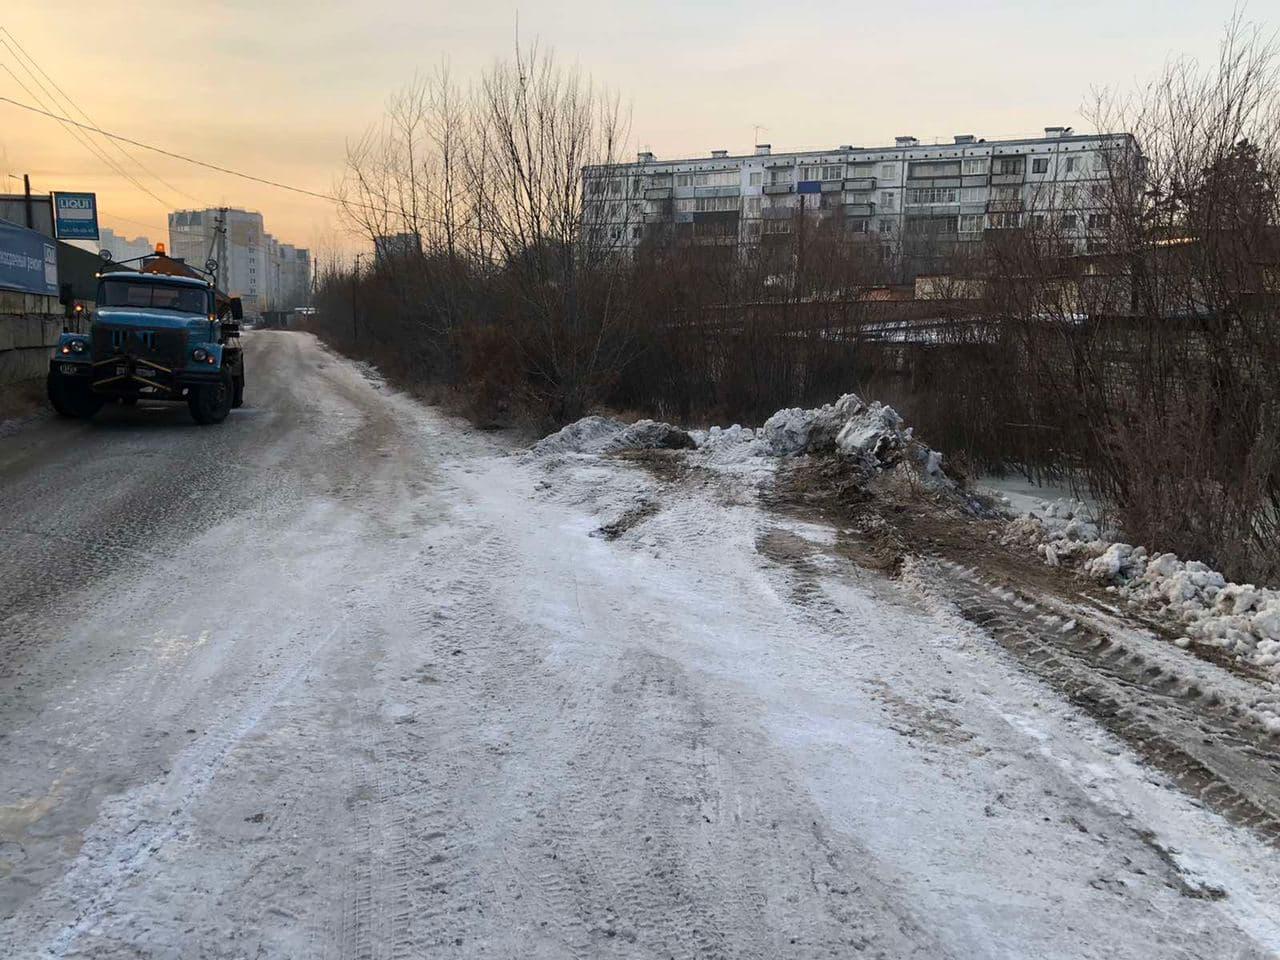 ДМРСУ устраняют последствия залива рекой улицы в Чите